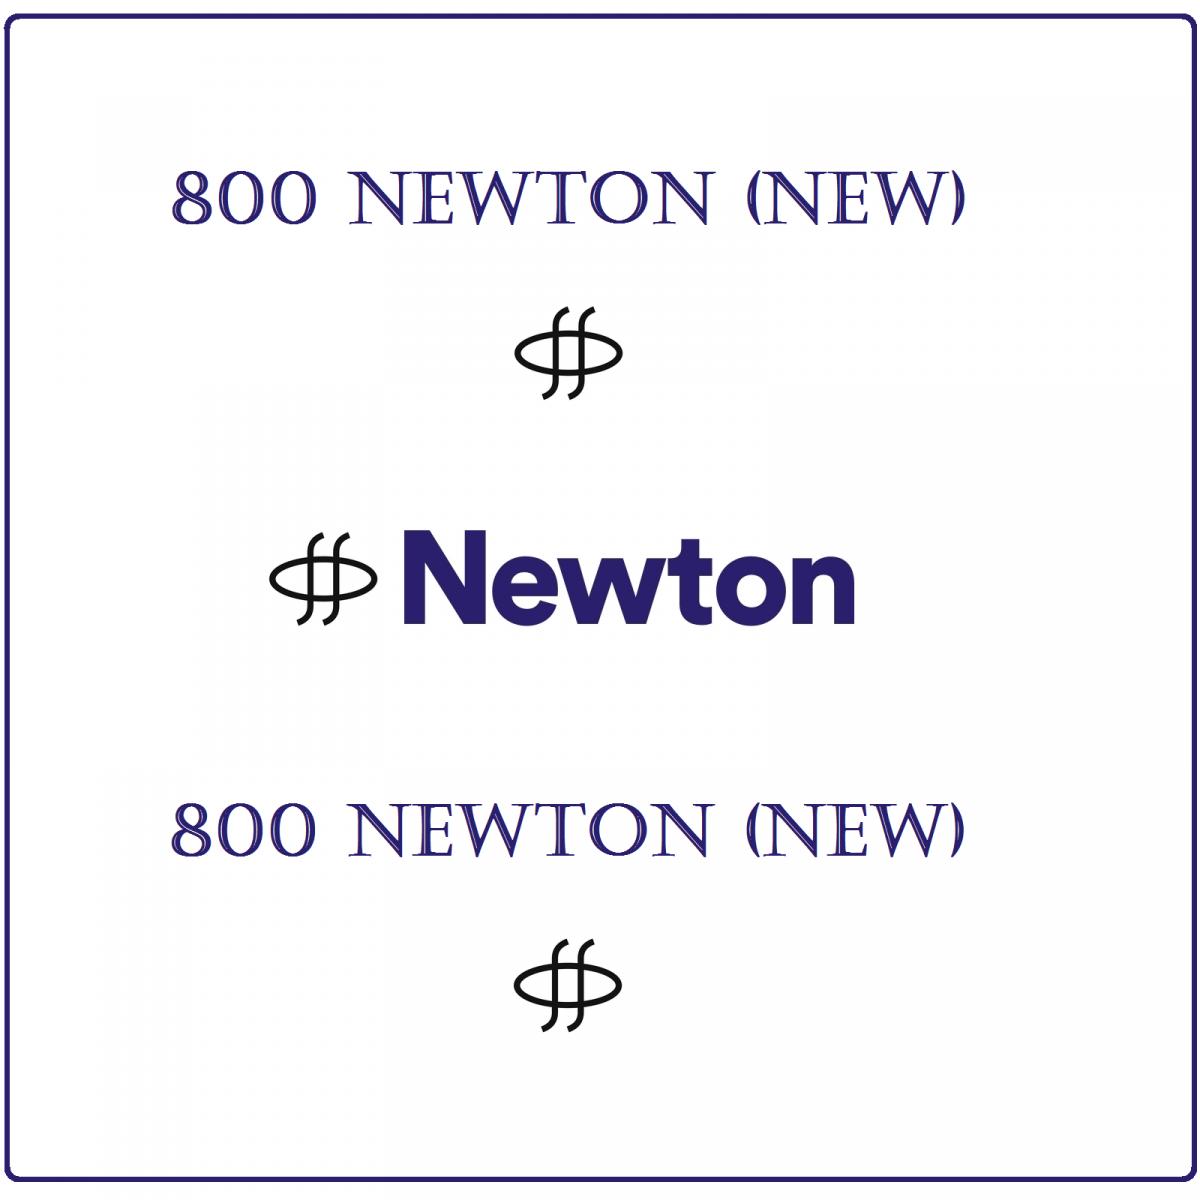 800 Newton (NEW) Mining Contract